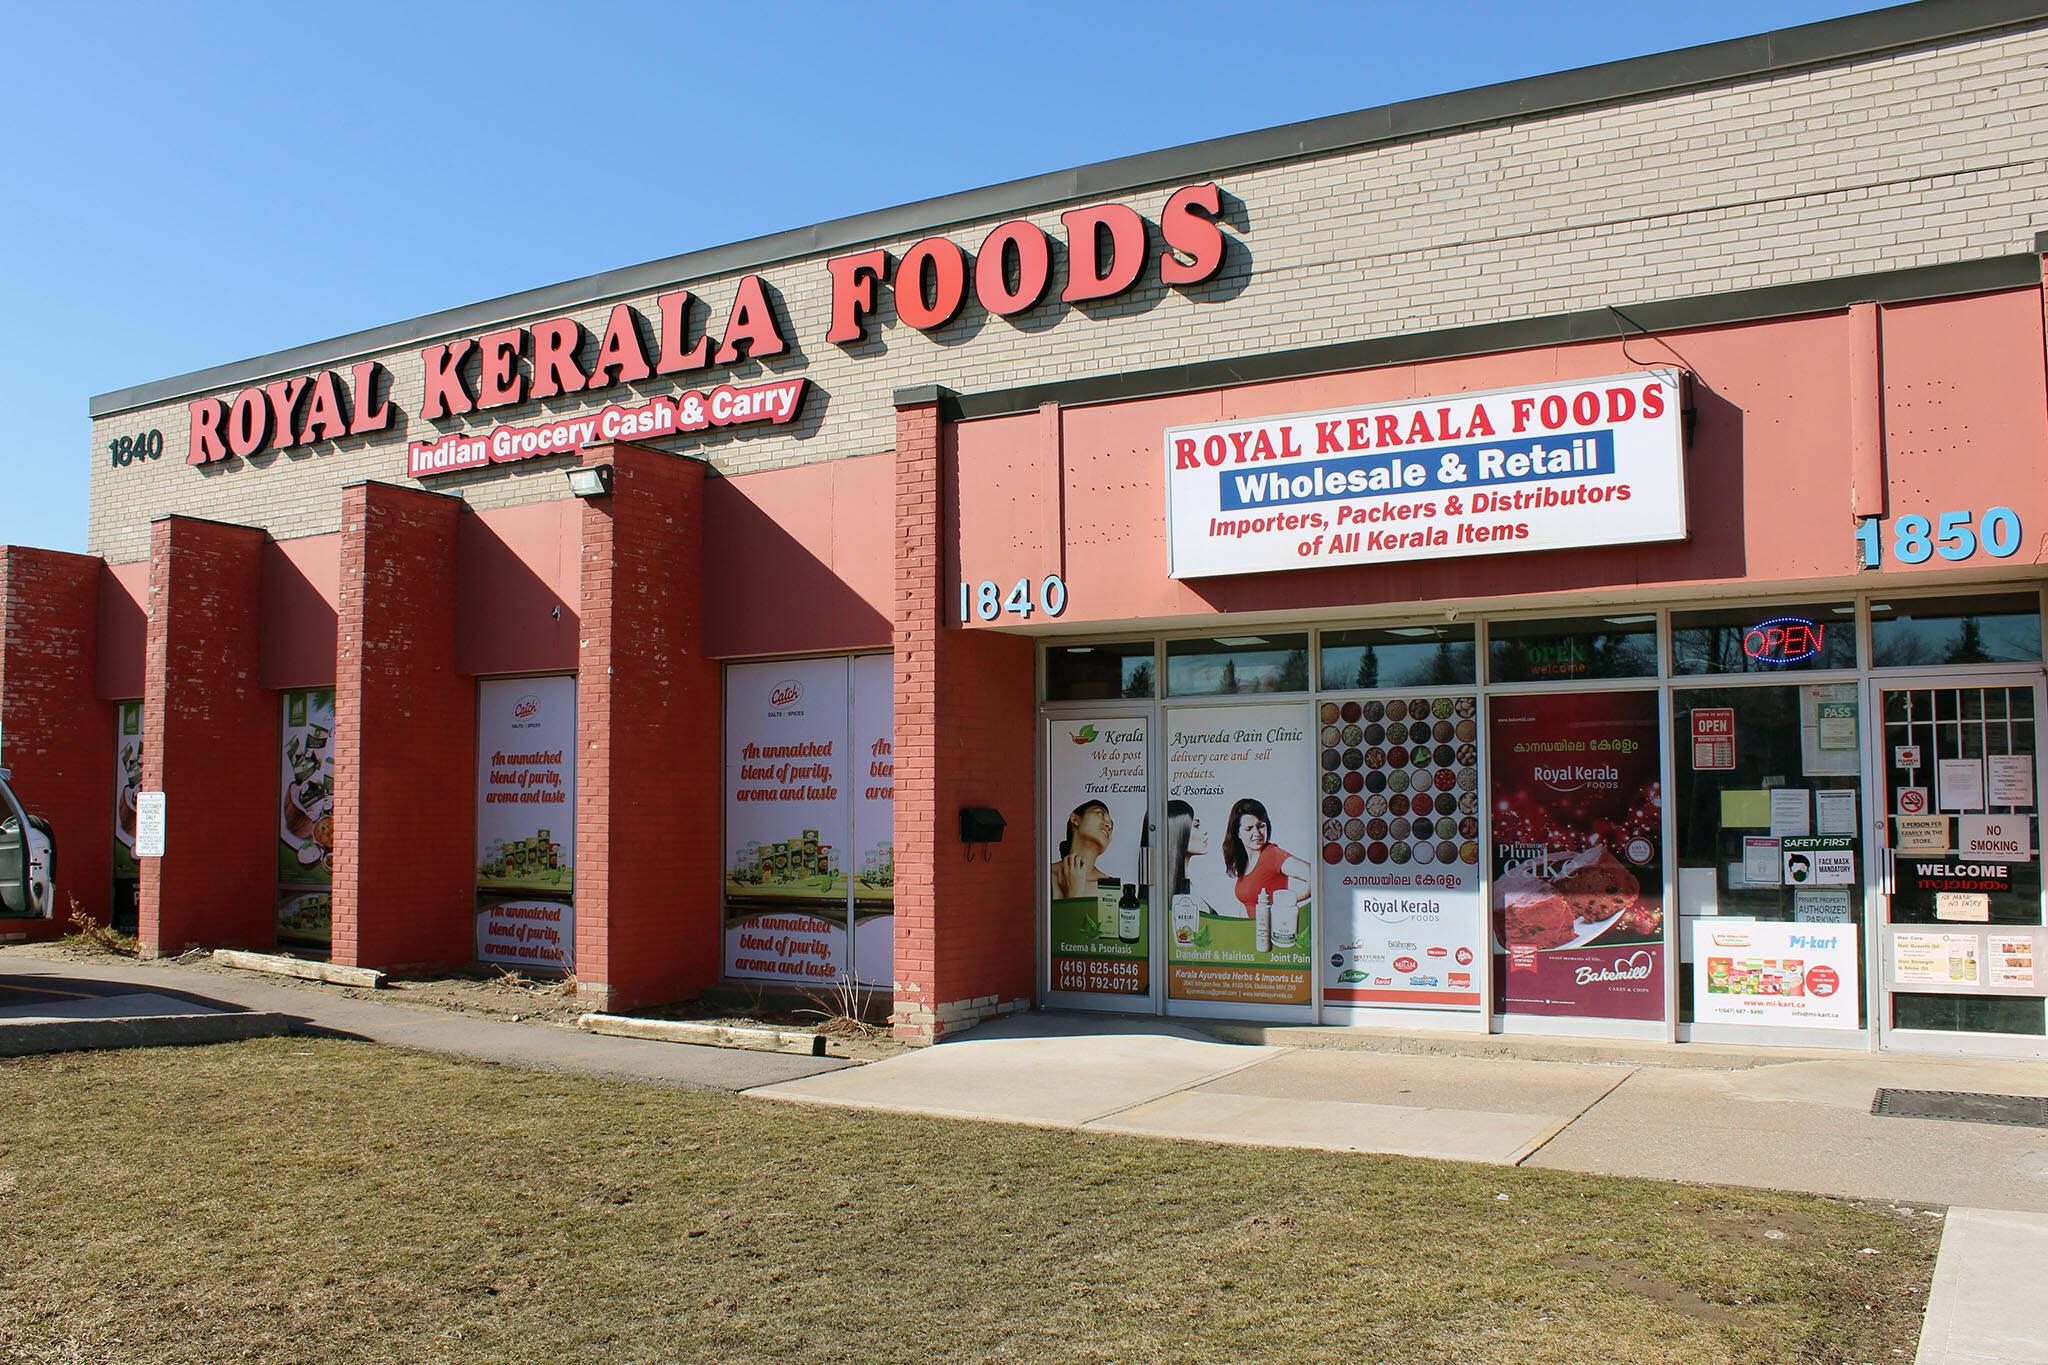 royal kerala foods toronto